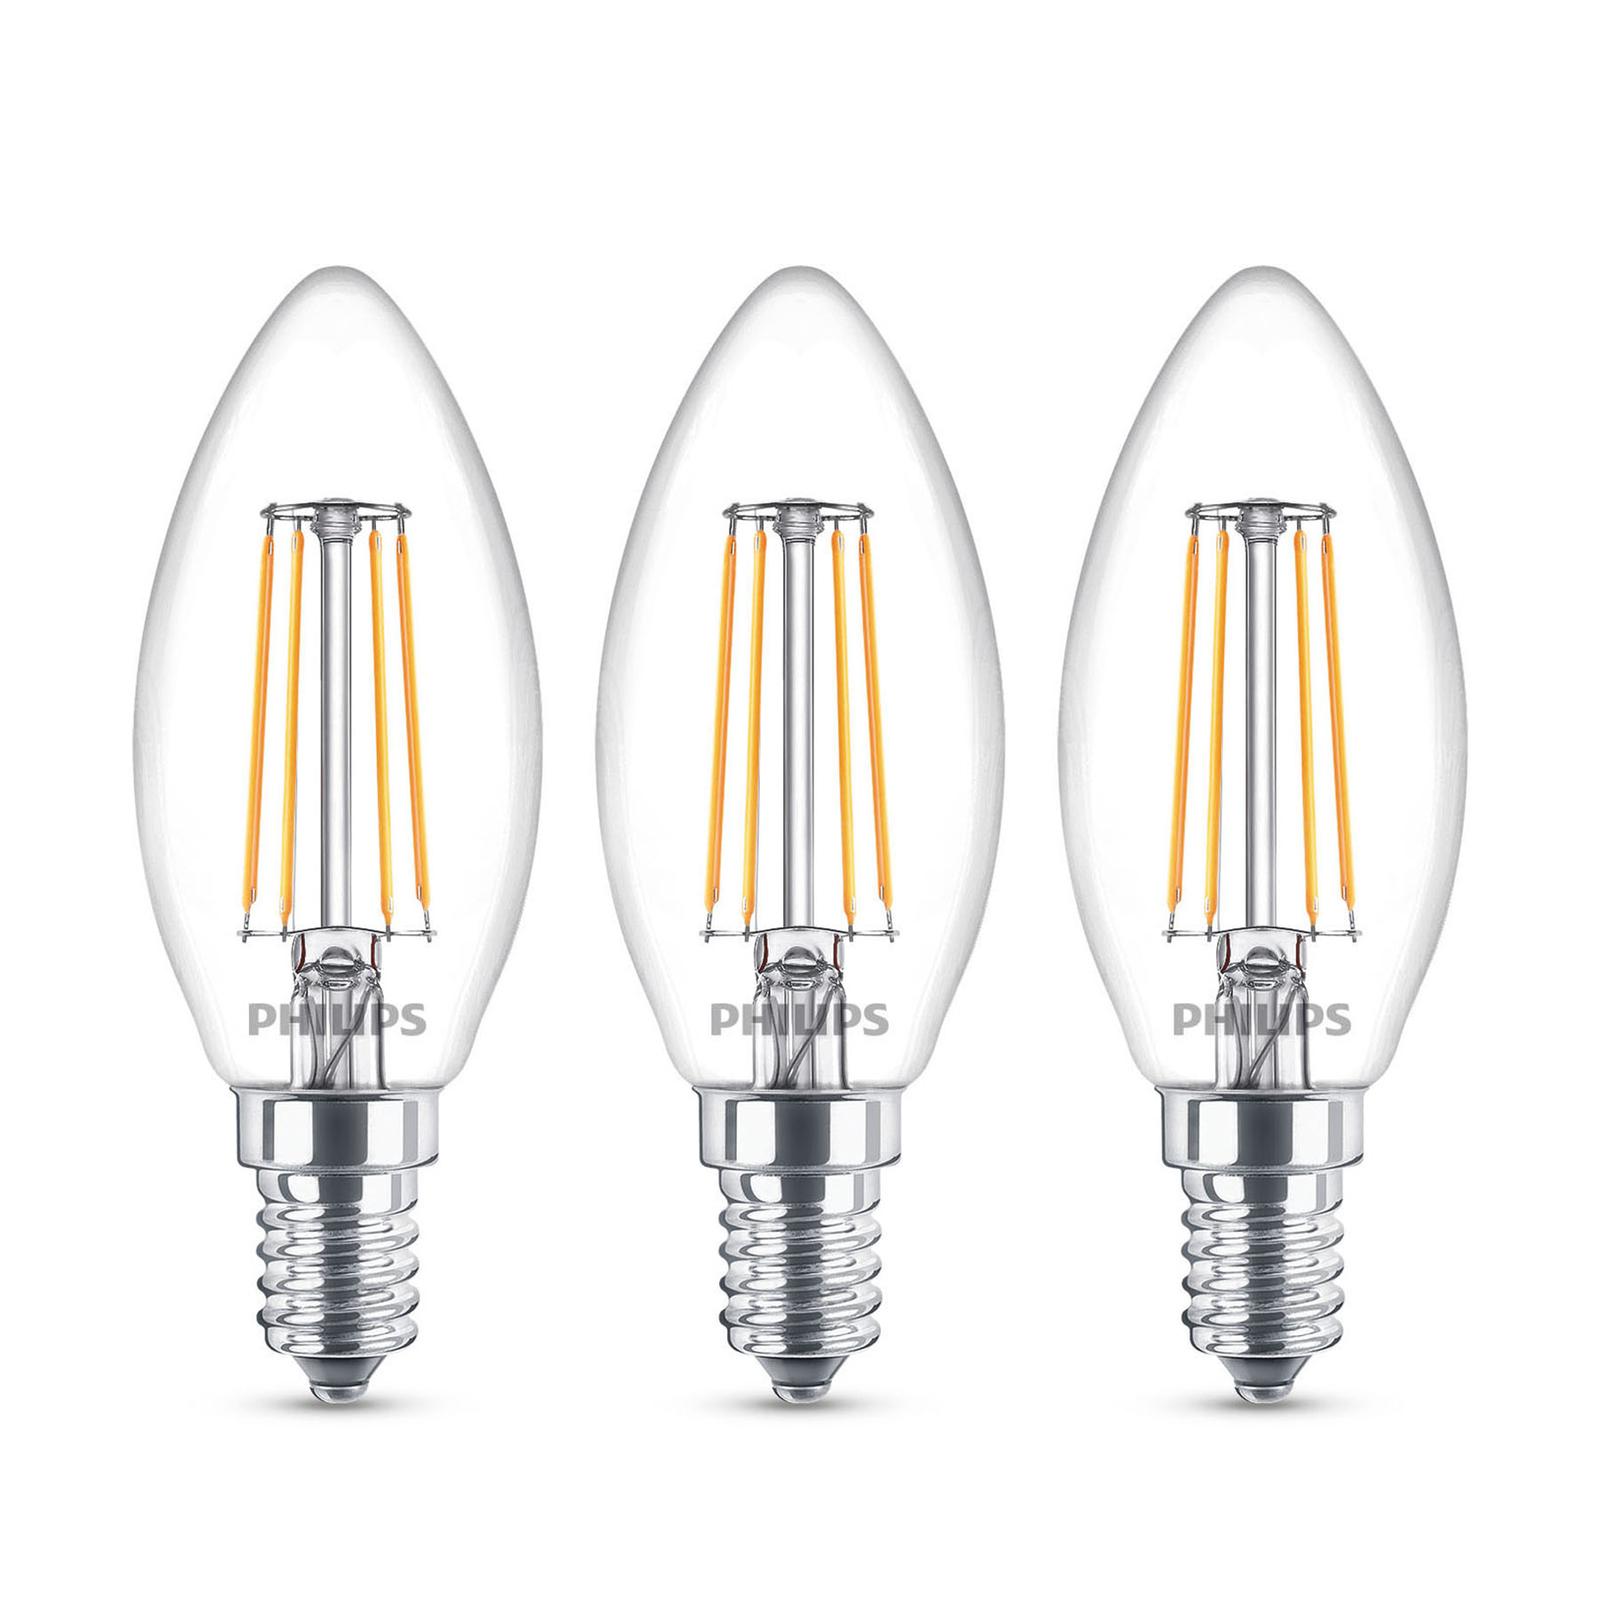 Philips LED-kronljuslampa E14 B35 4,3 W klar